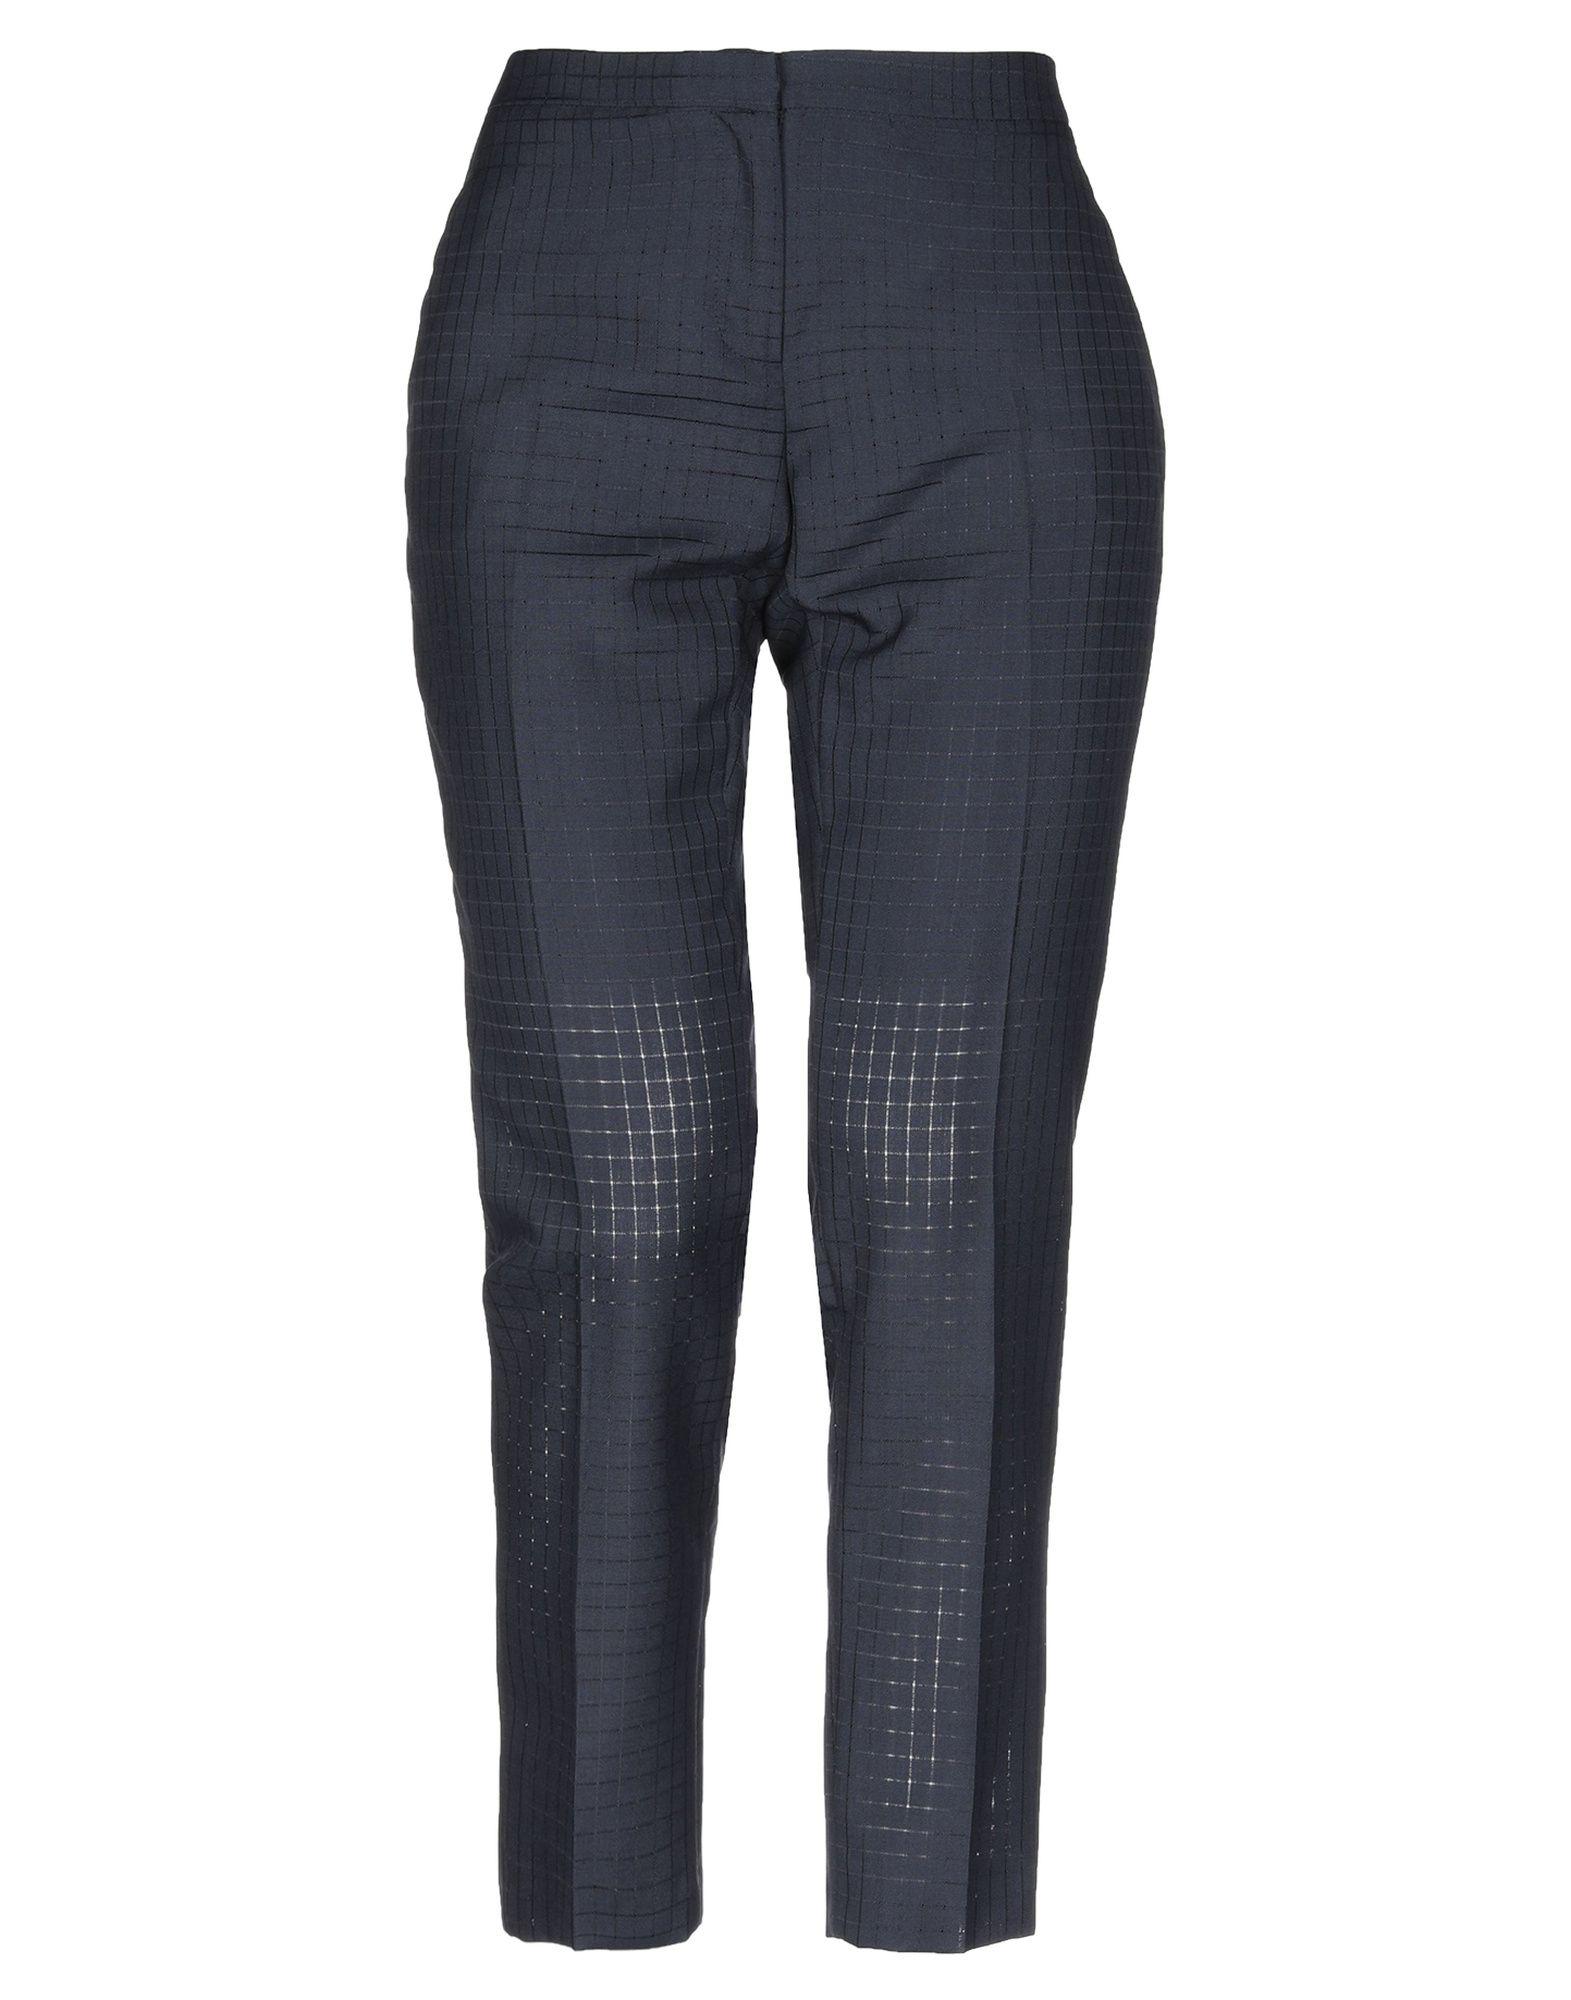 TWISTY PARALLEL UNIVERSE Повседневные брюки twisty parallel universe джинсовые брюки